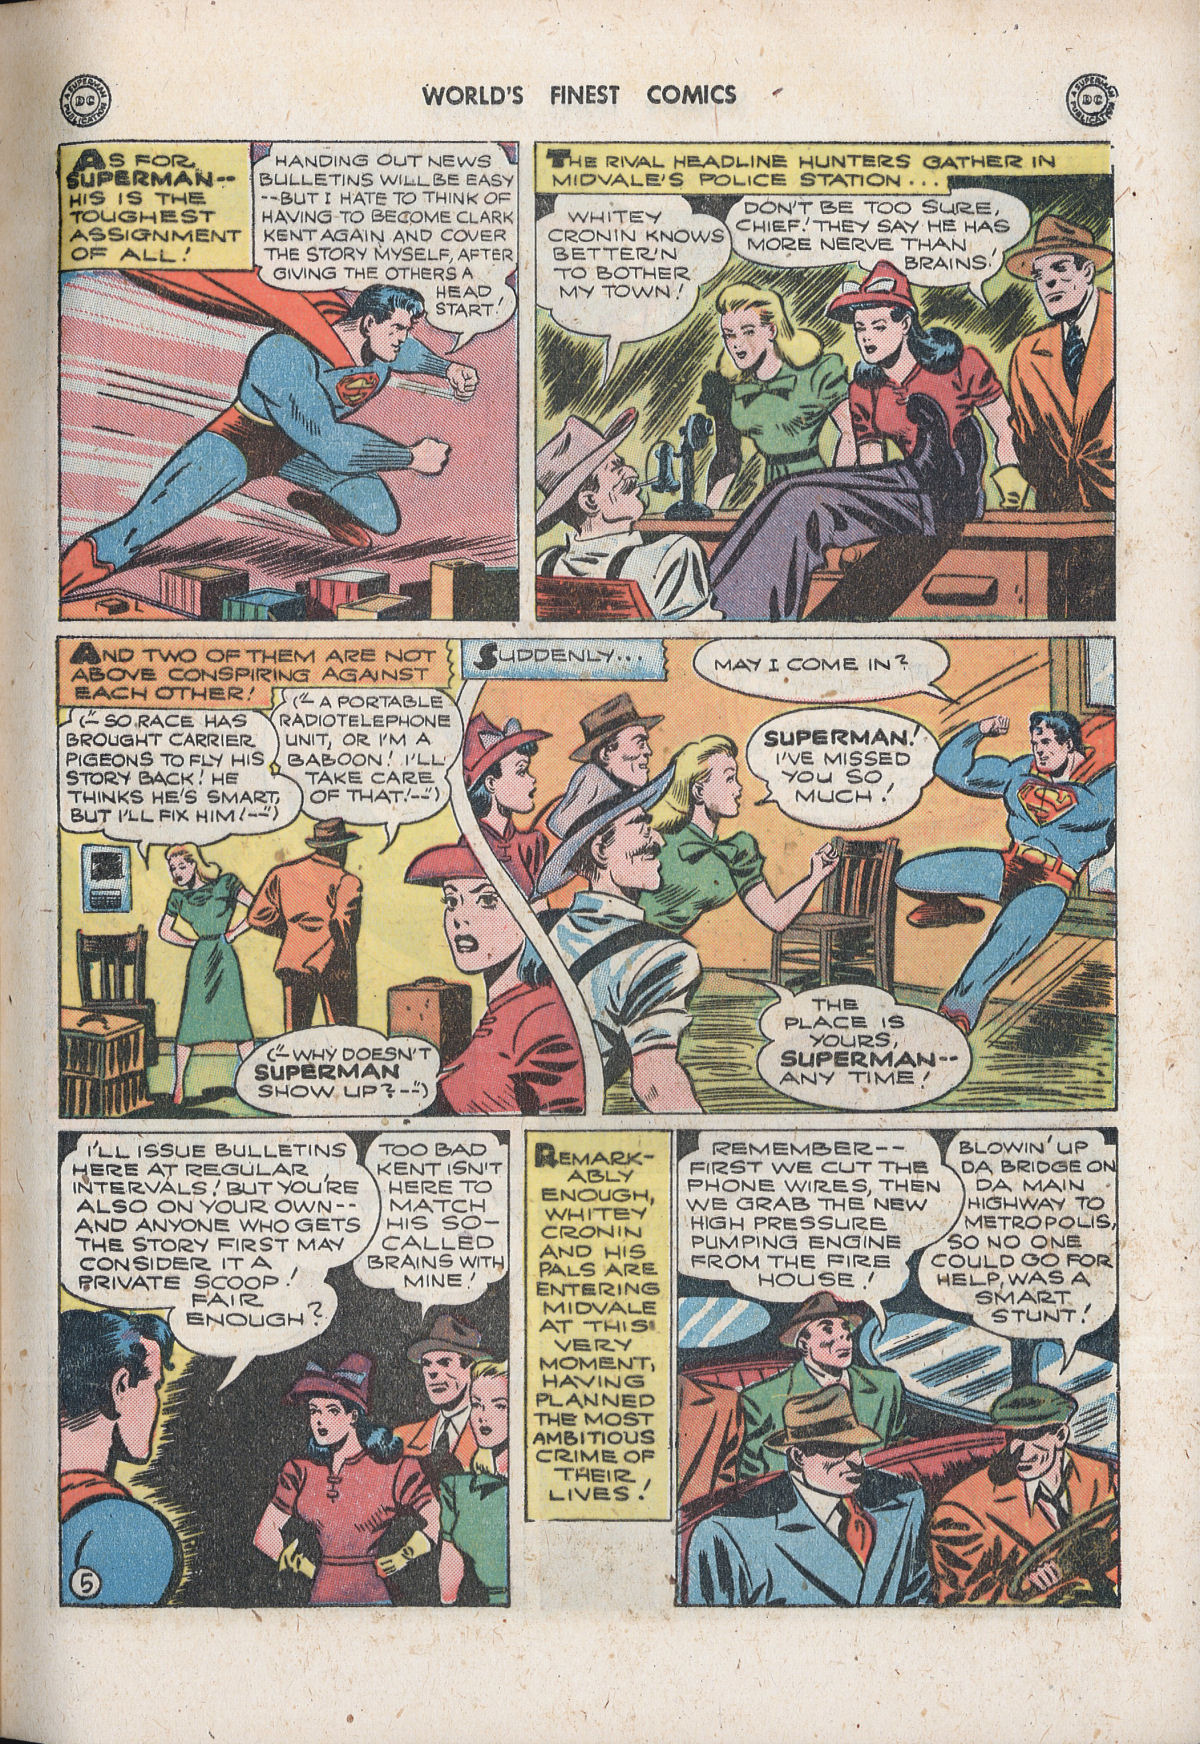 Read online World's Finest Comics comic -  Issue #33 - 7